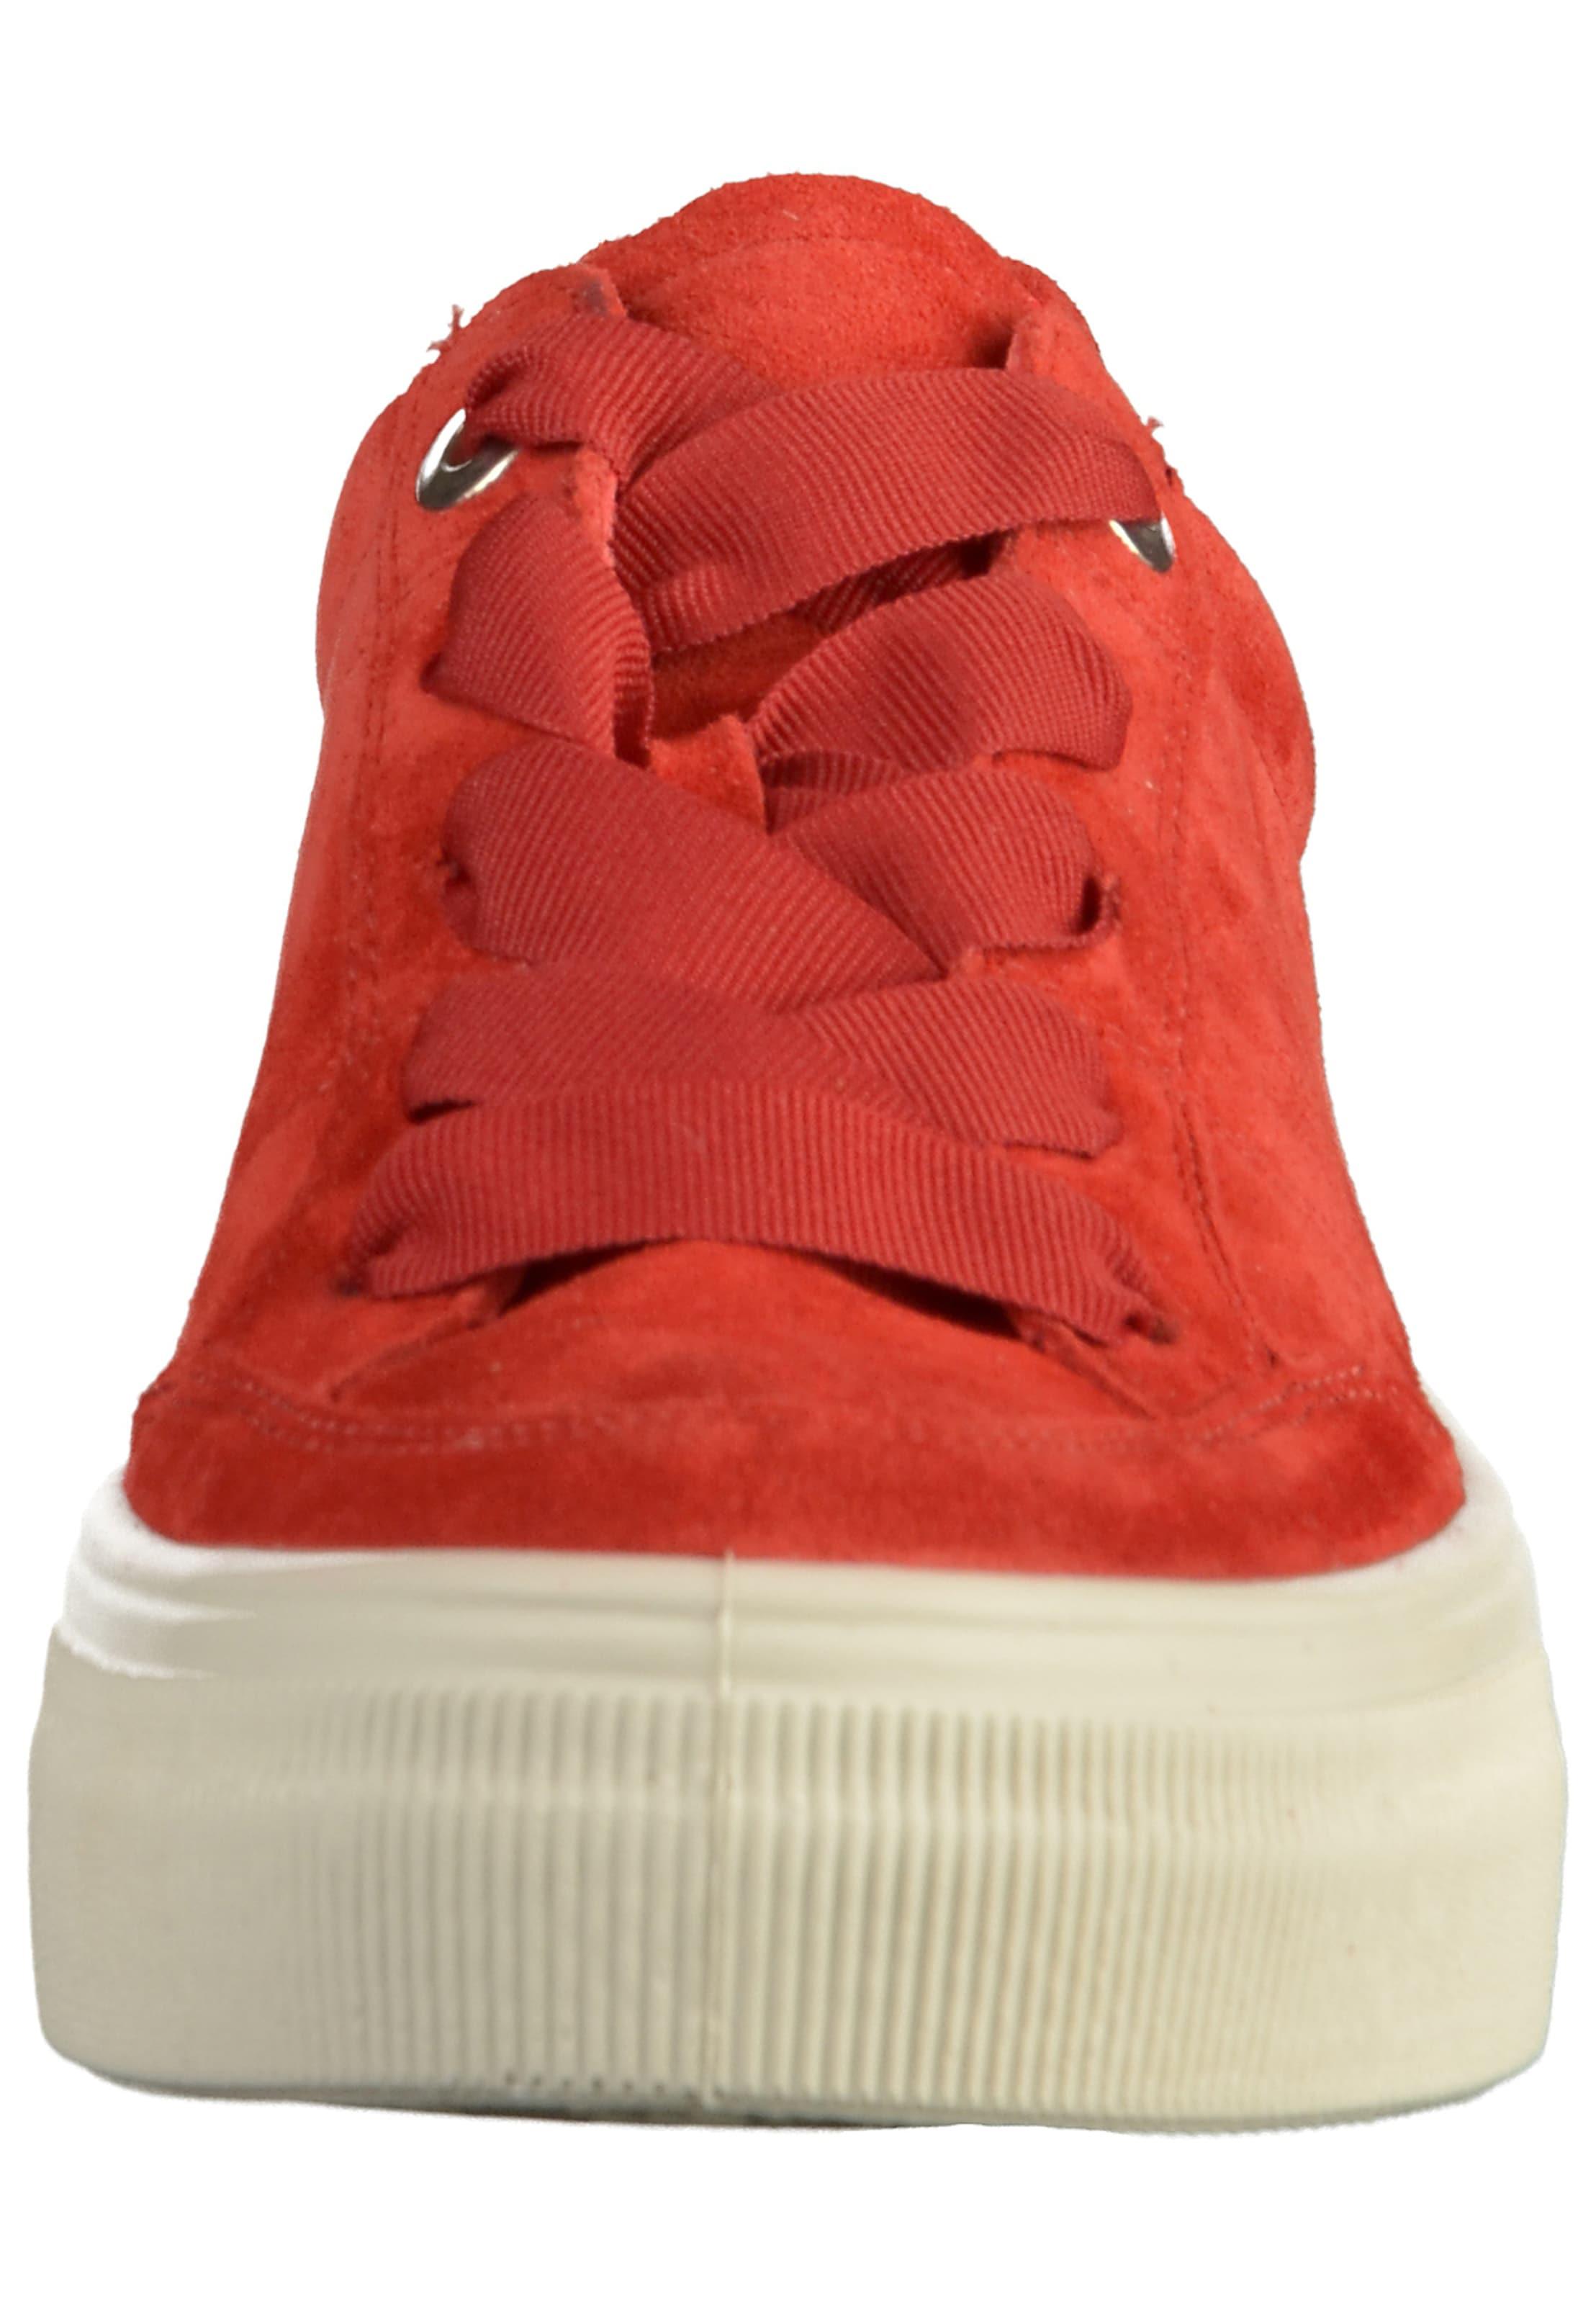 En Legero Basses Baskets Legero Baskets Basses En Rouge Rouge OXiuPkZ